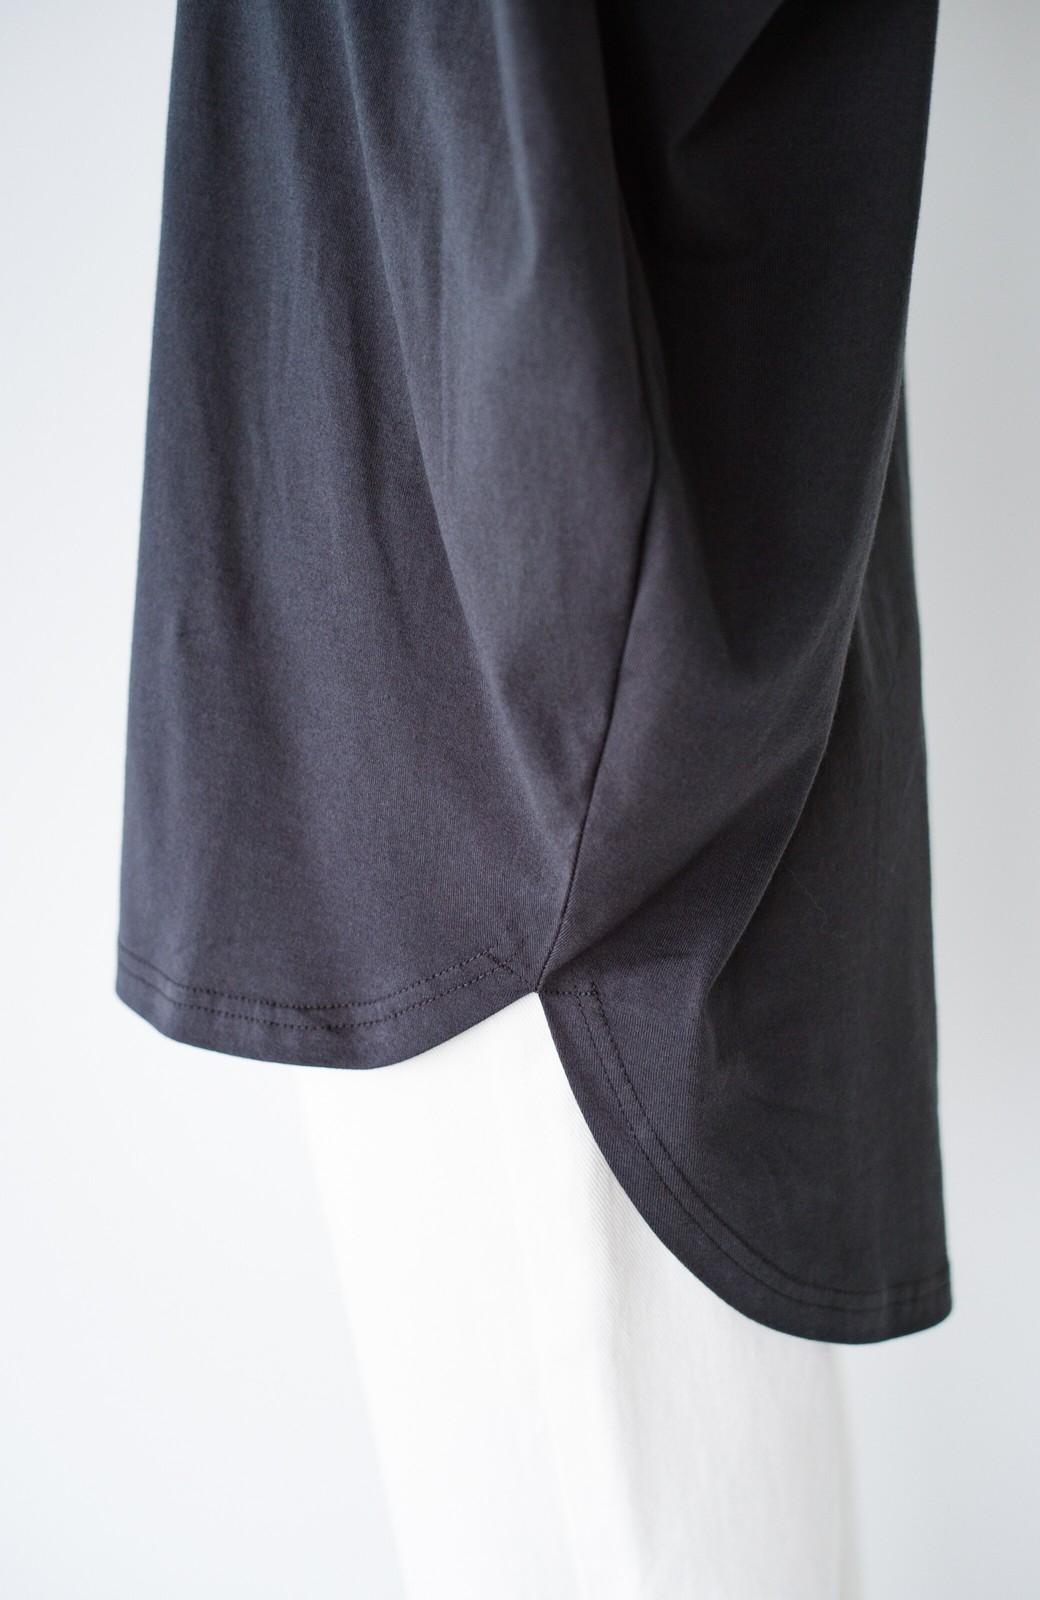 haco! PBPオーガニックコットン 楽ちんなのにブラウス気分で着られる大人のおめかしTシャツ <チャコールグレー>の商品写真6